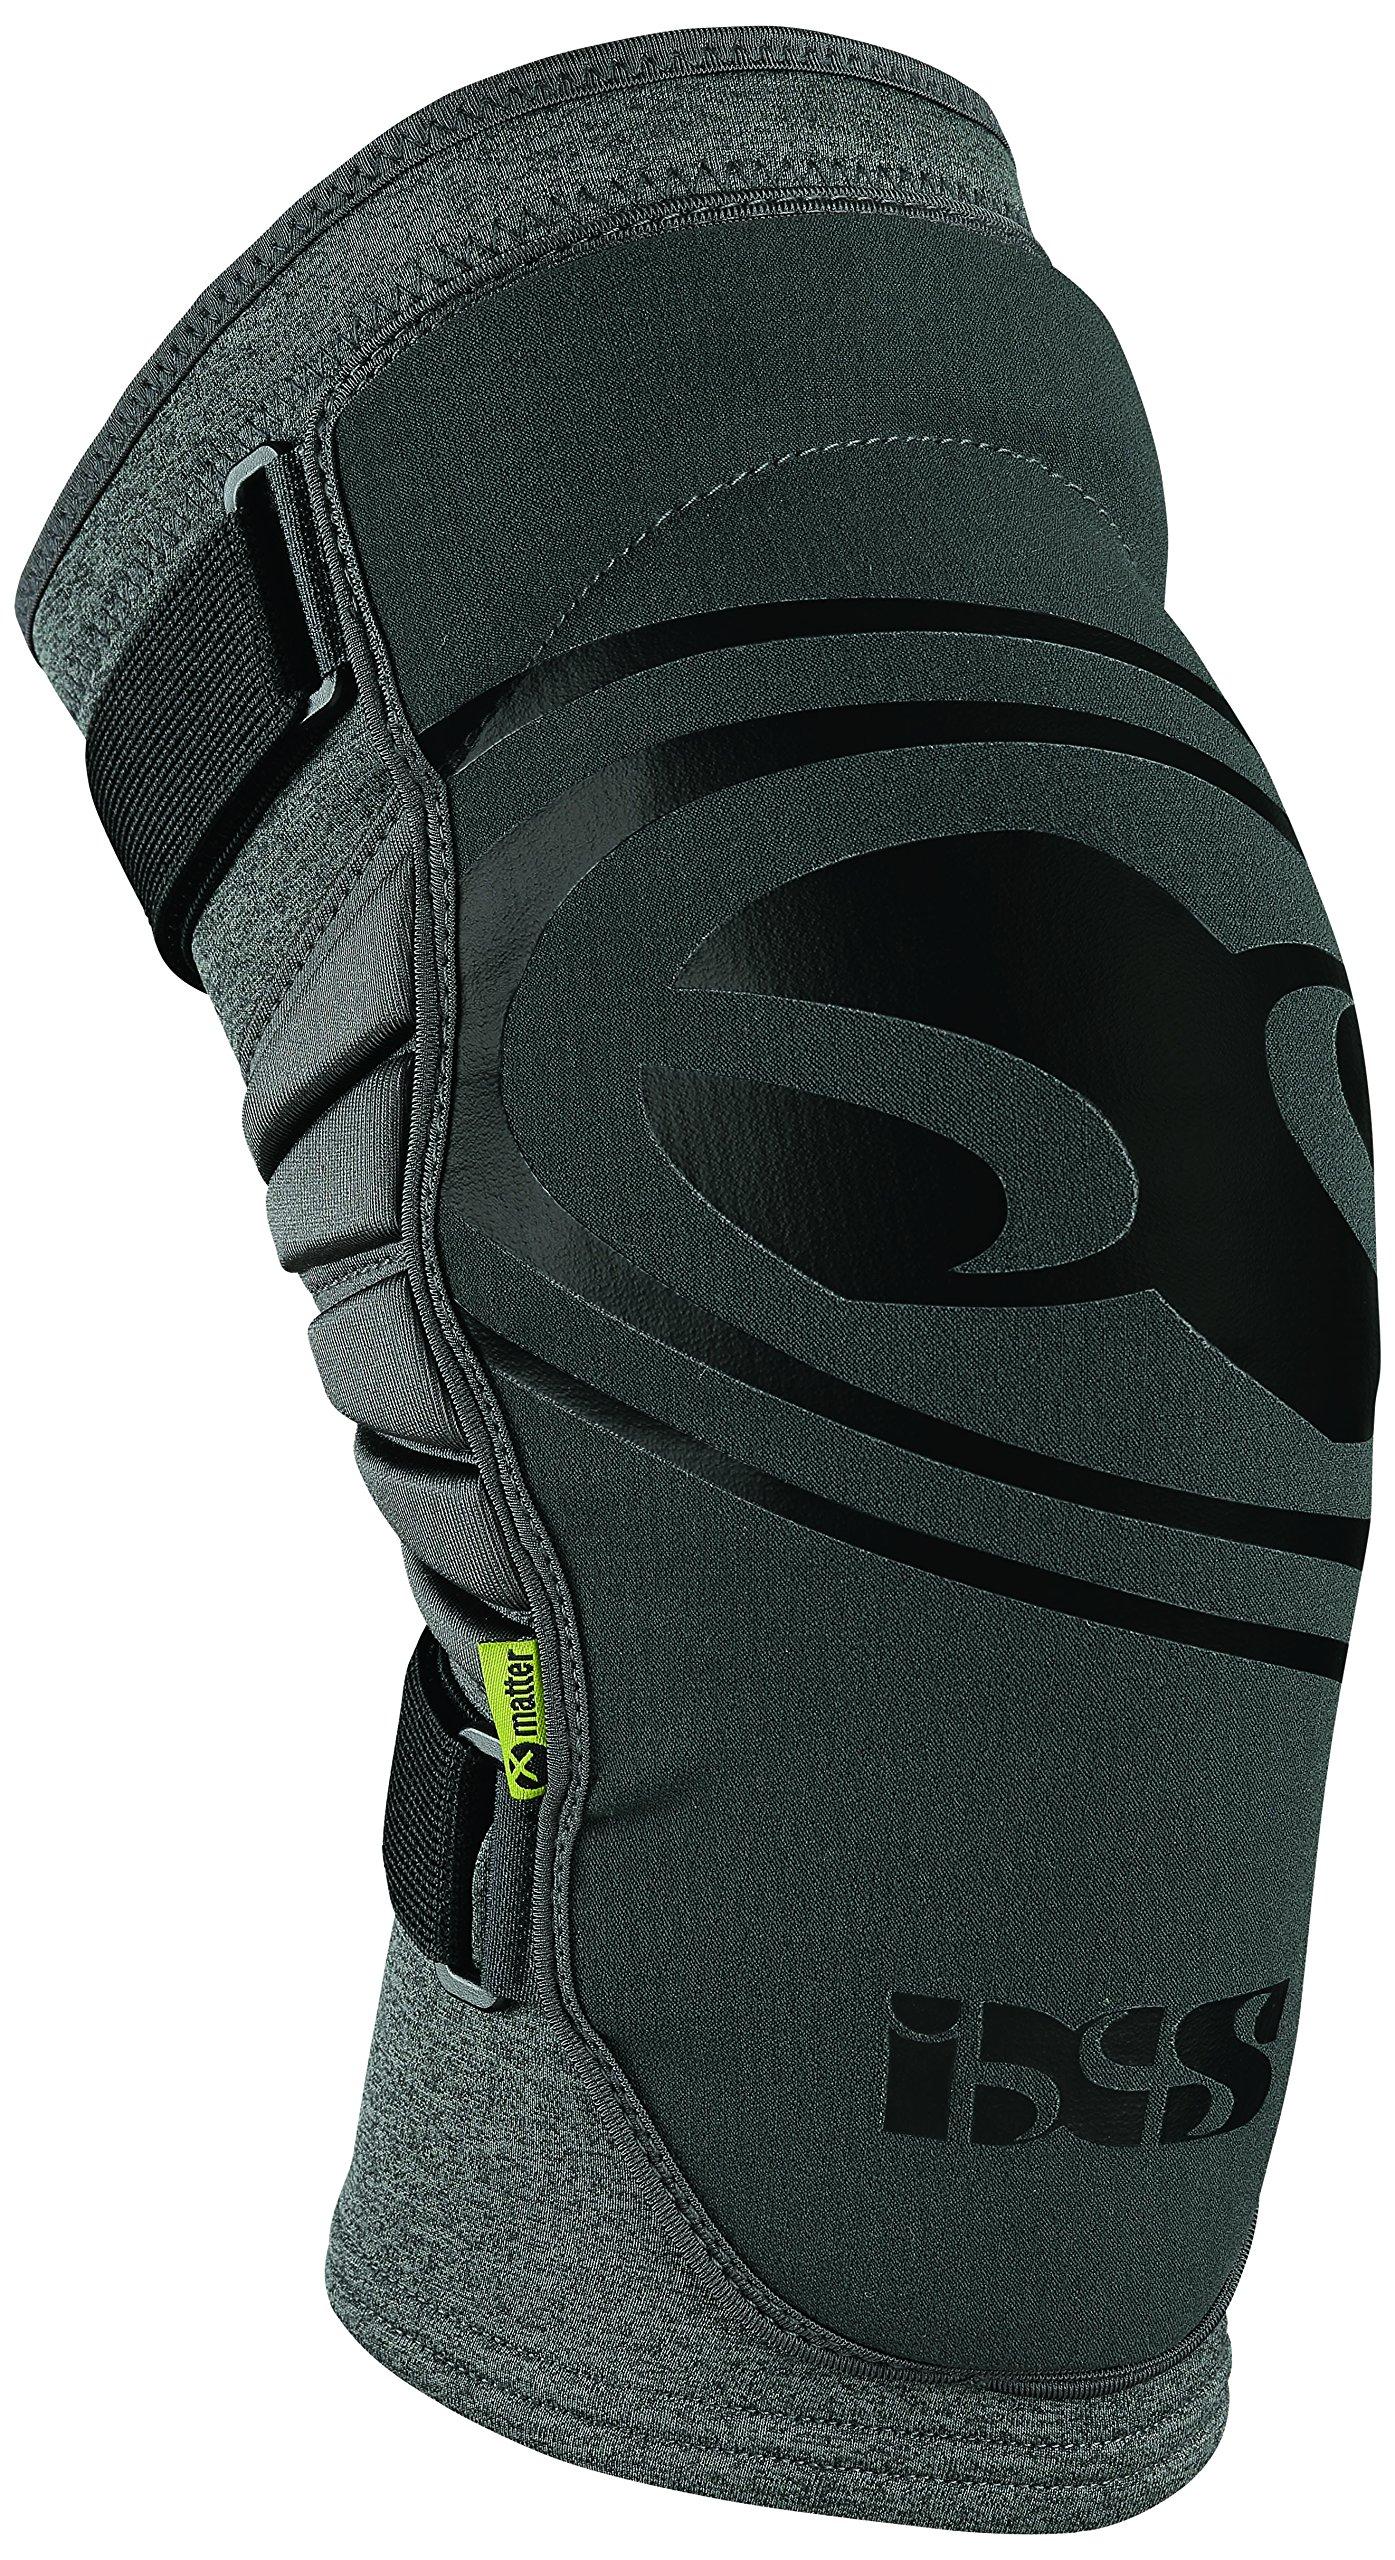 IXS The Carve Evo Knee Pad Grey, XL